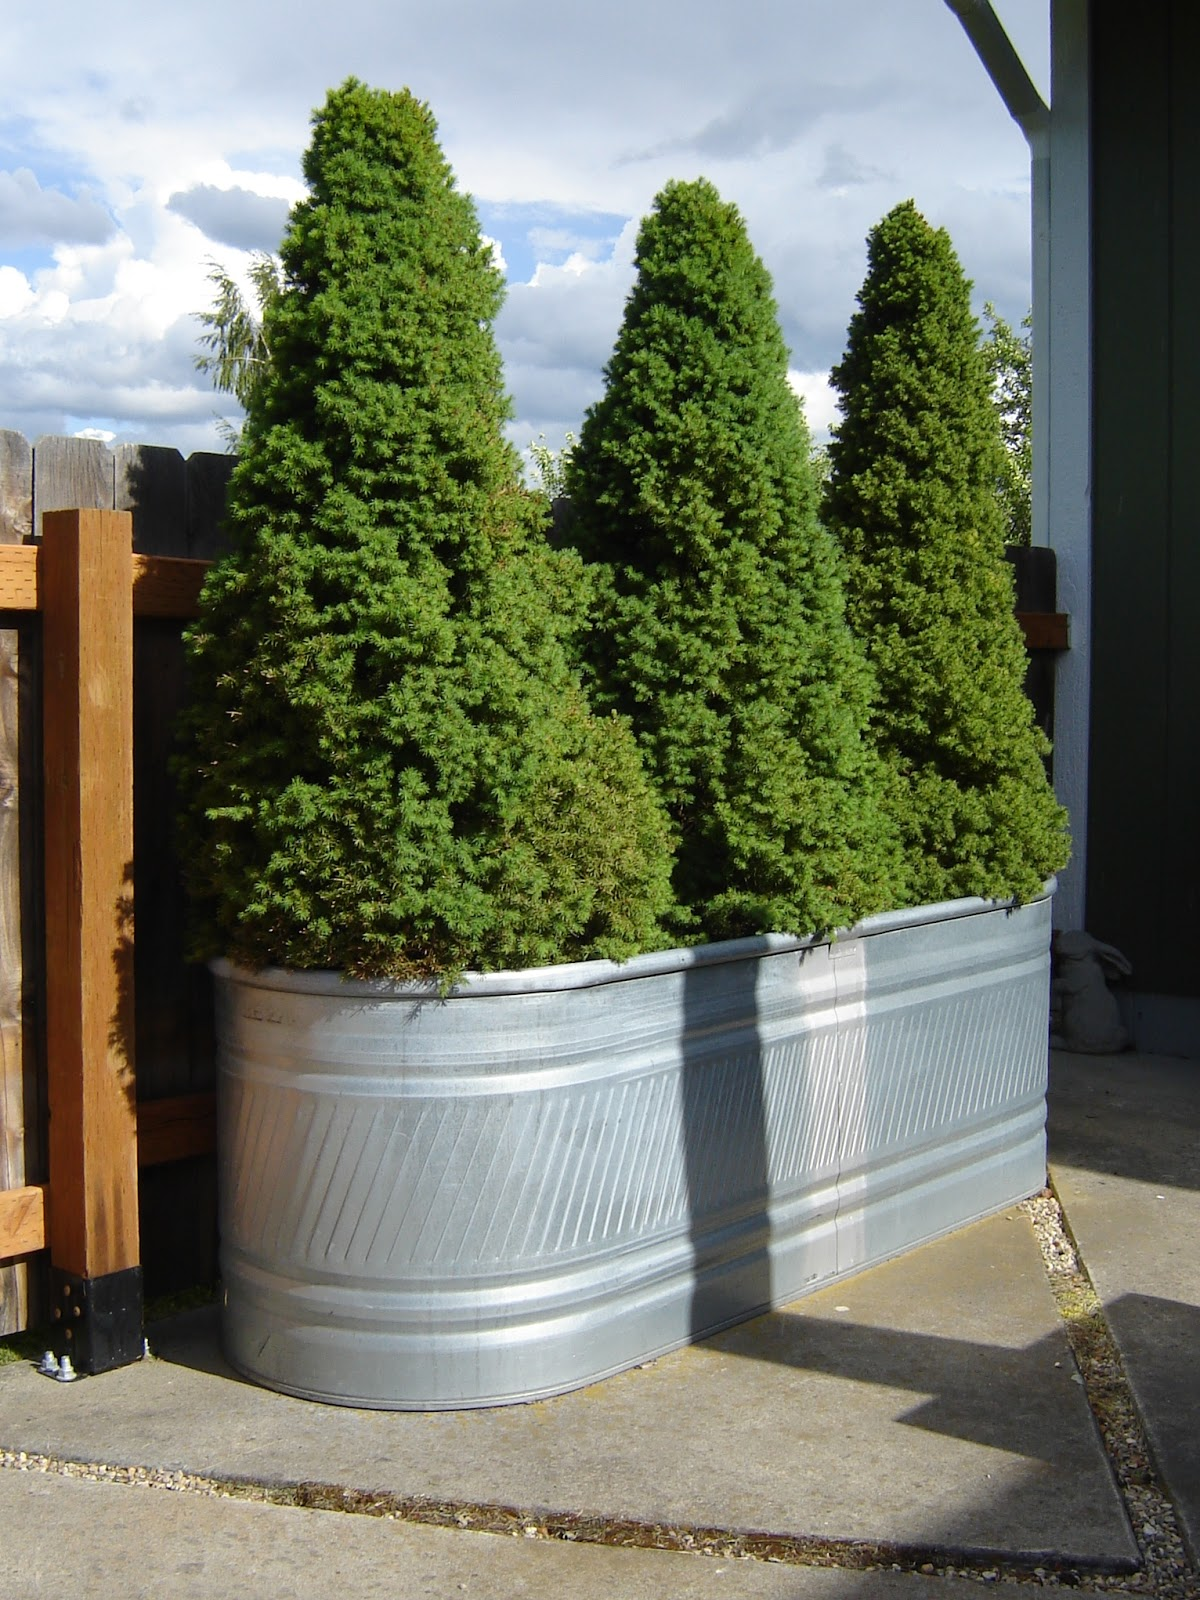 Spruce Feed Trough Planters